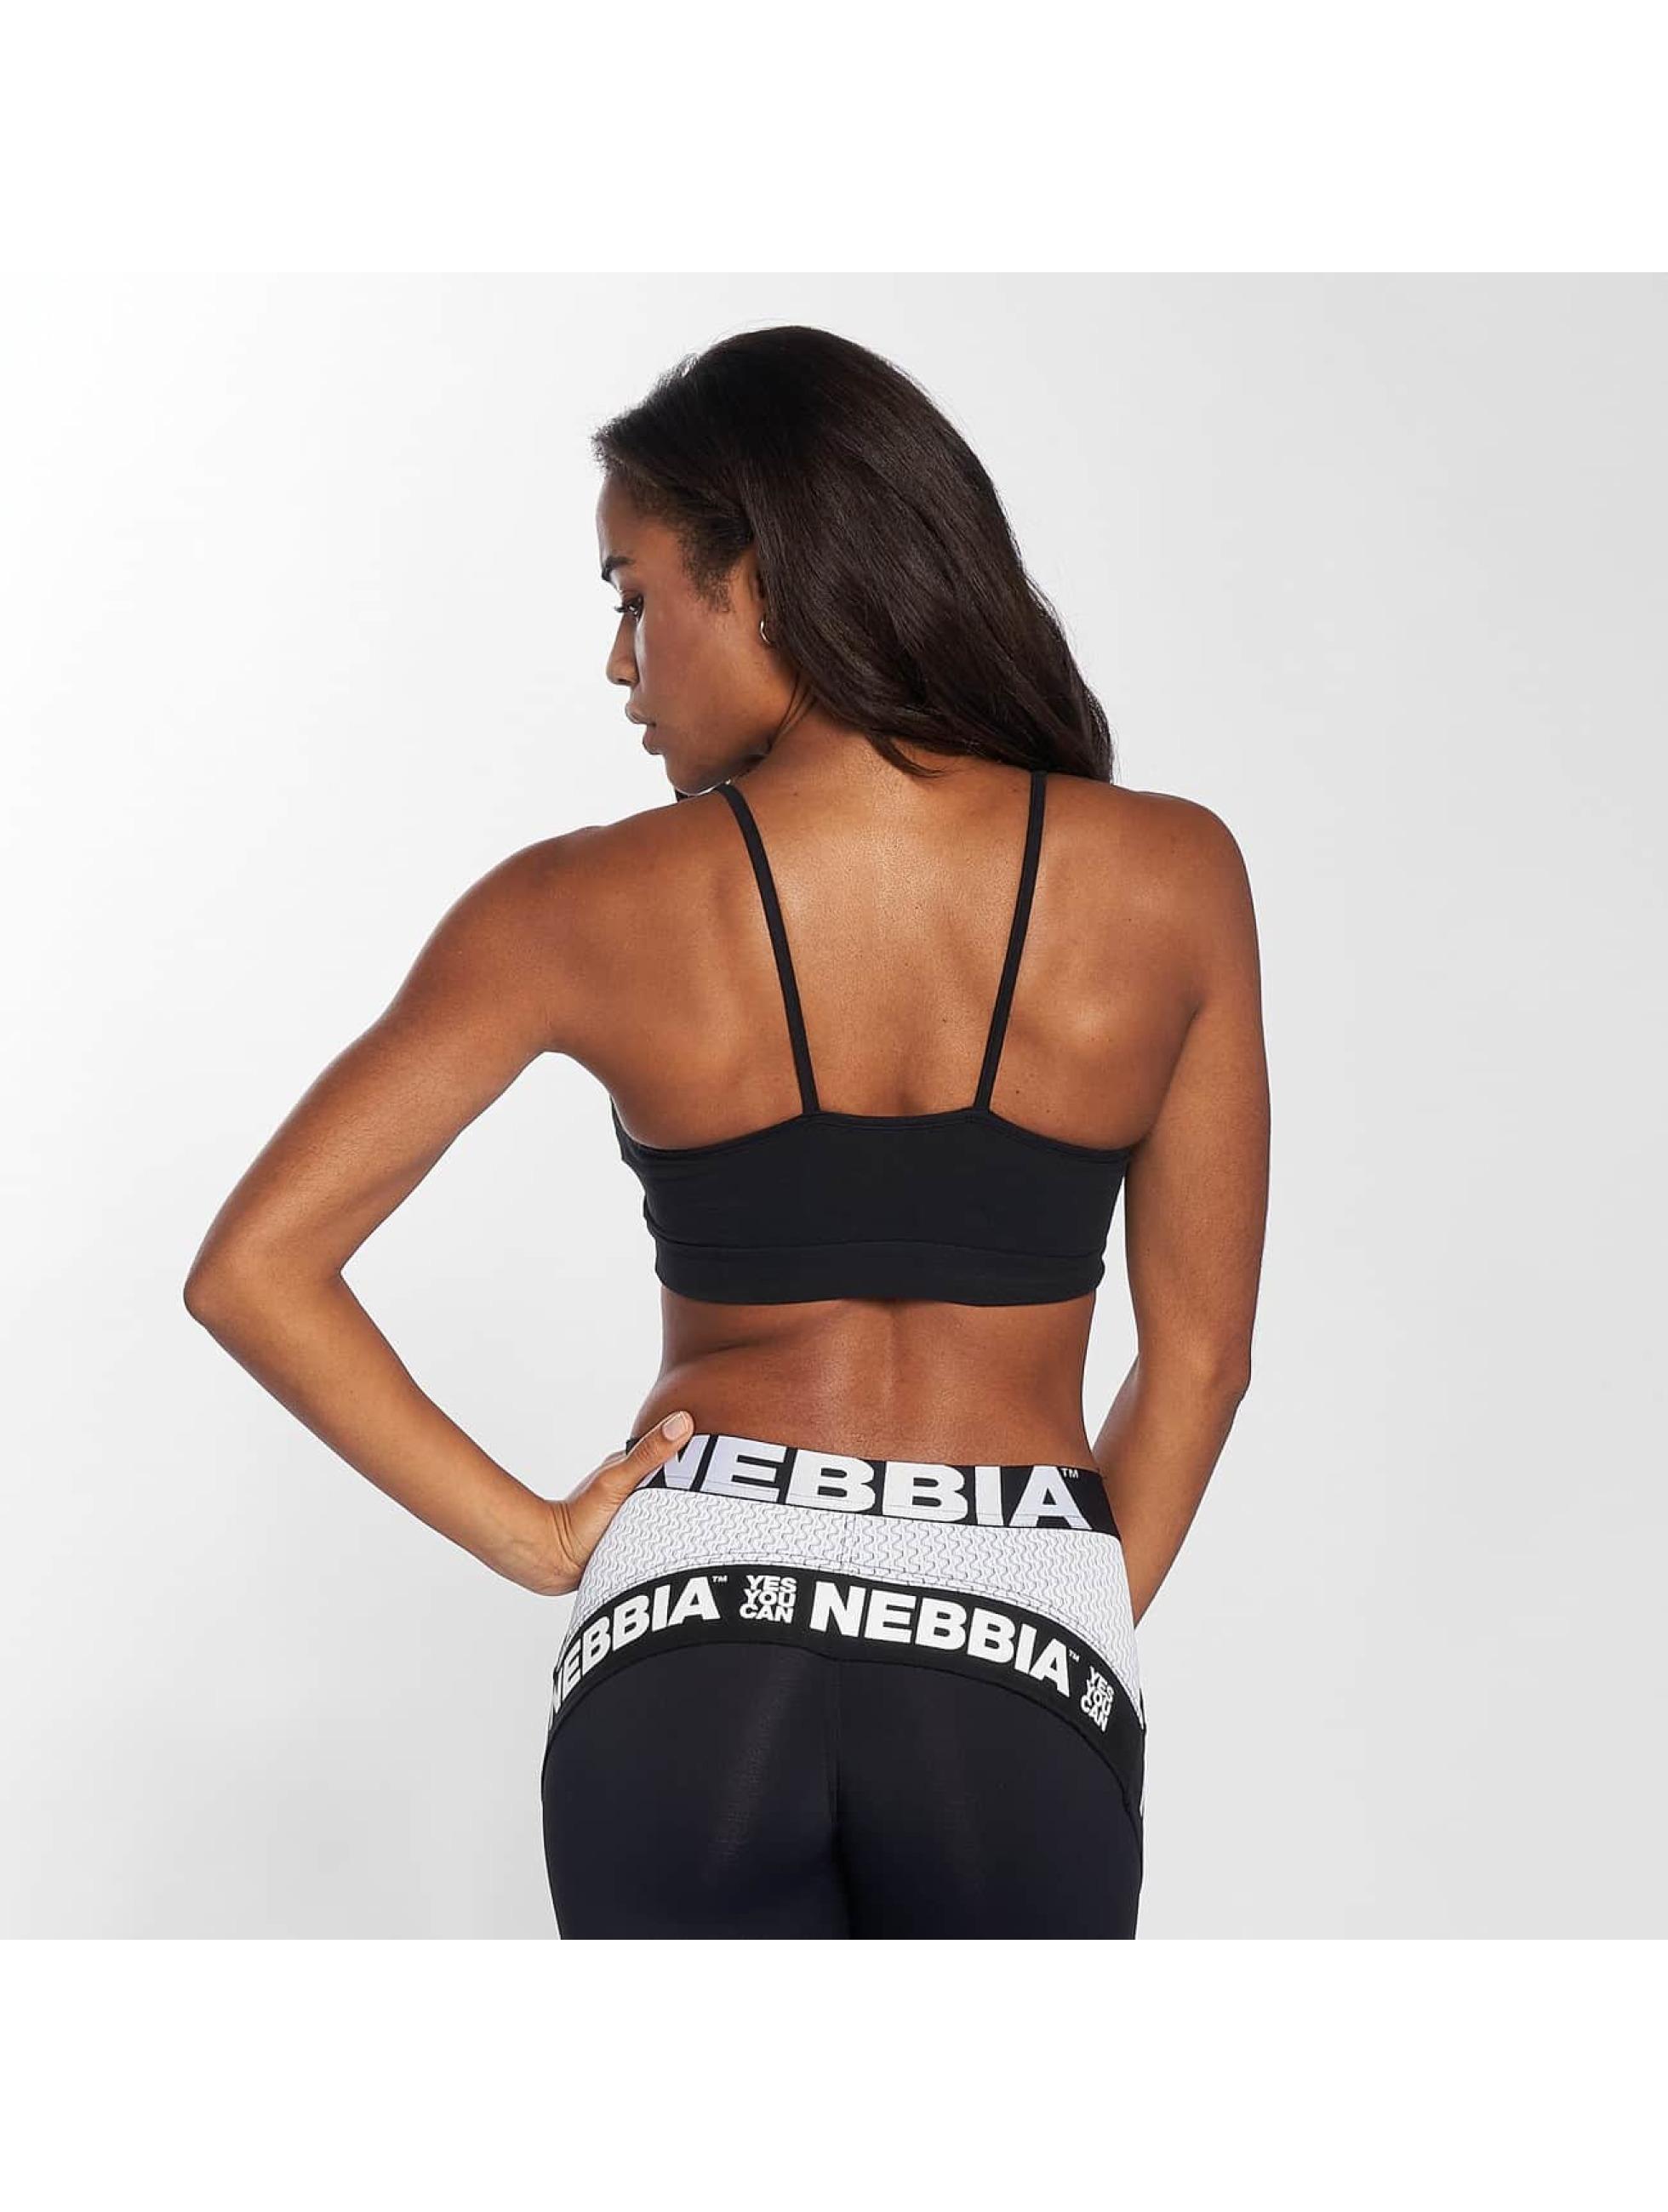 Nebbia Undertøj Logo sort